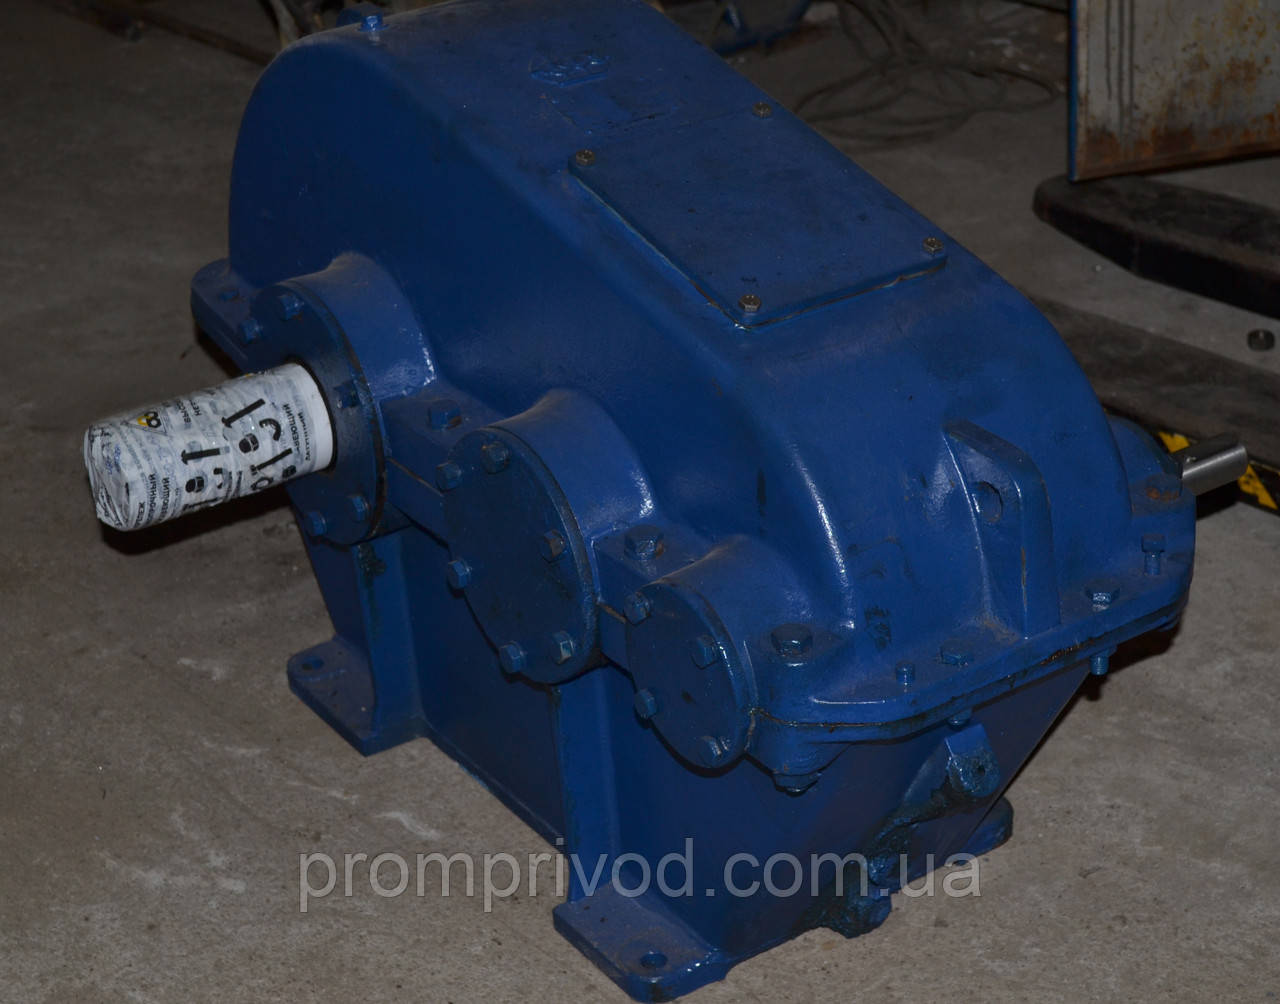 Редуктор РМ-400-20-12